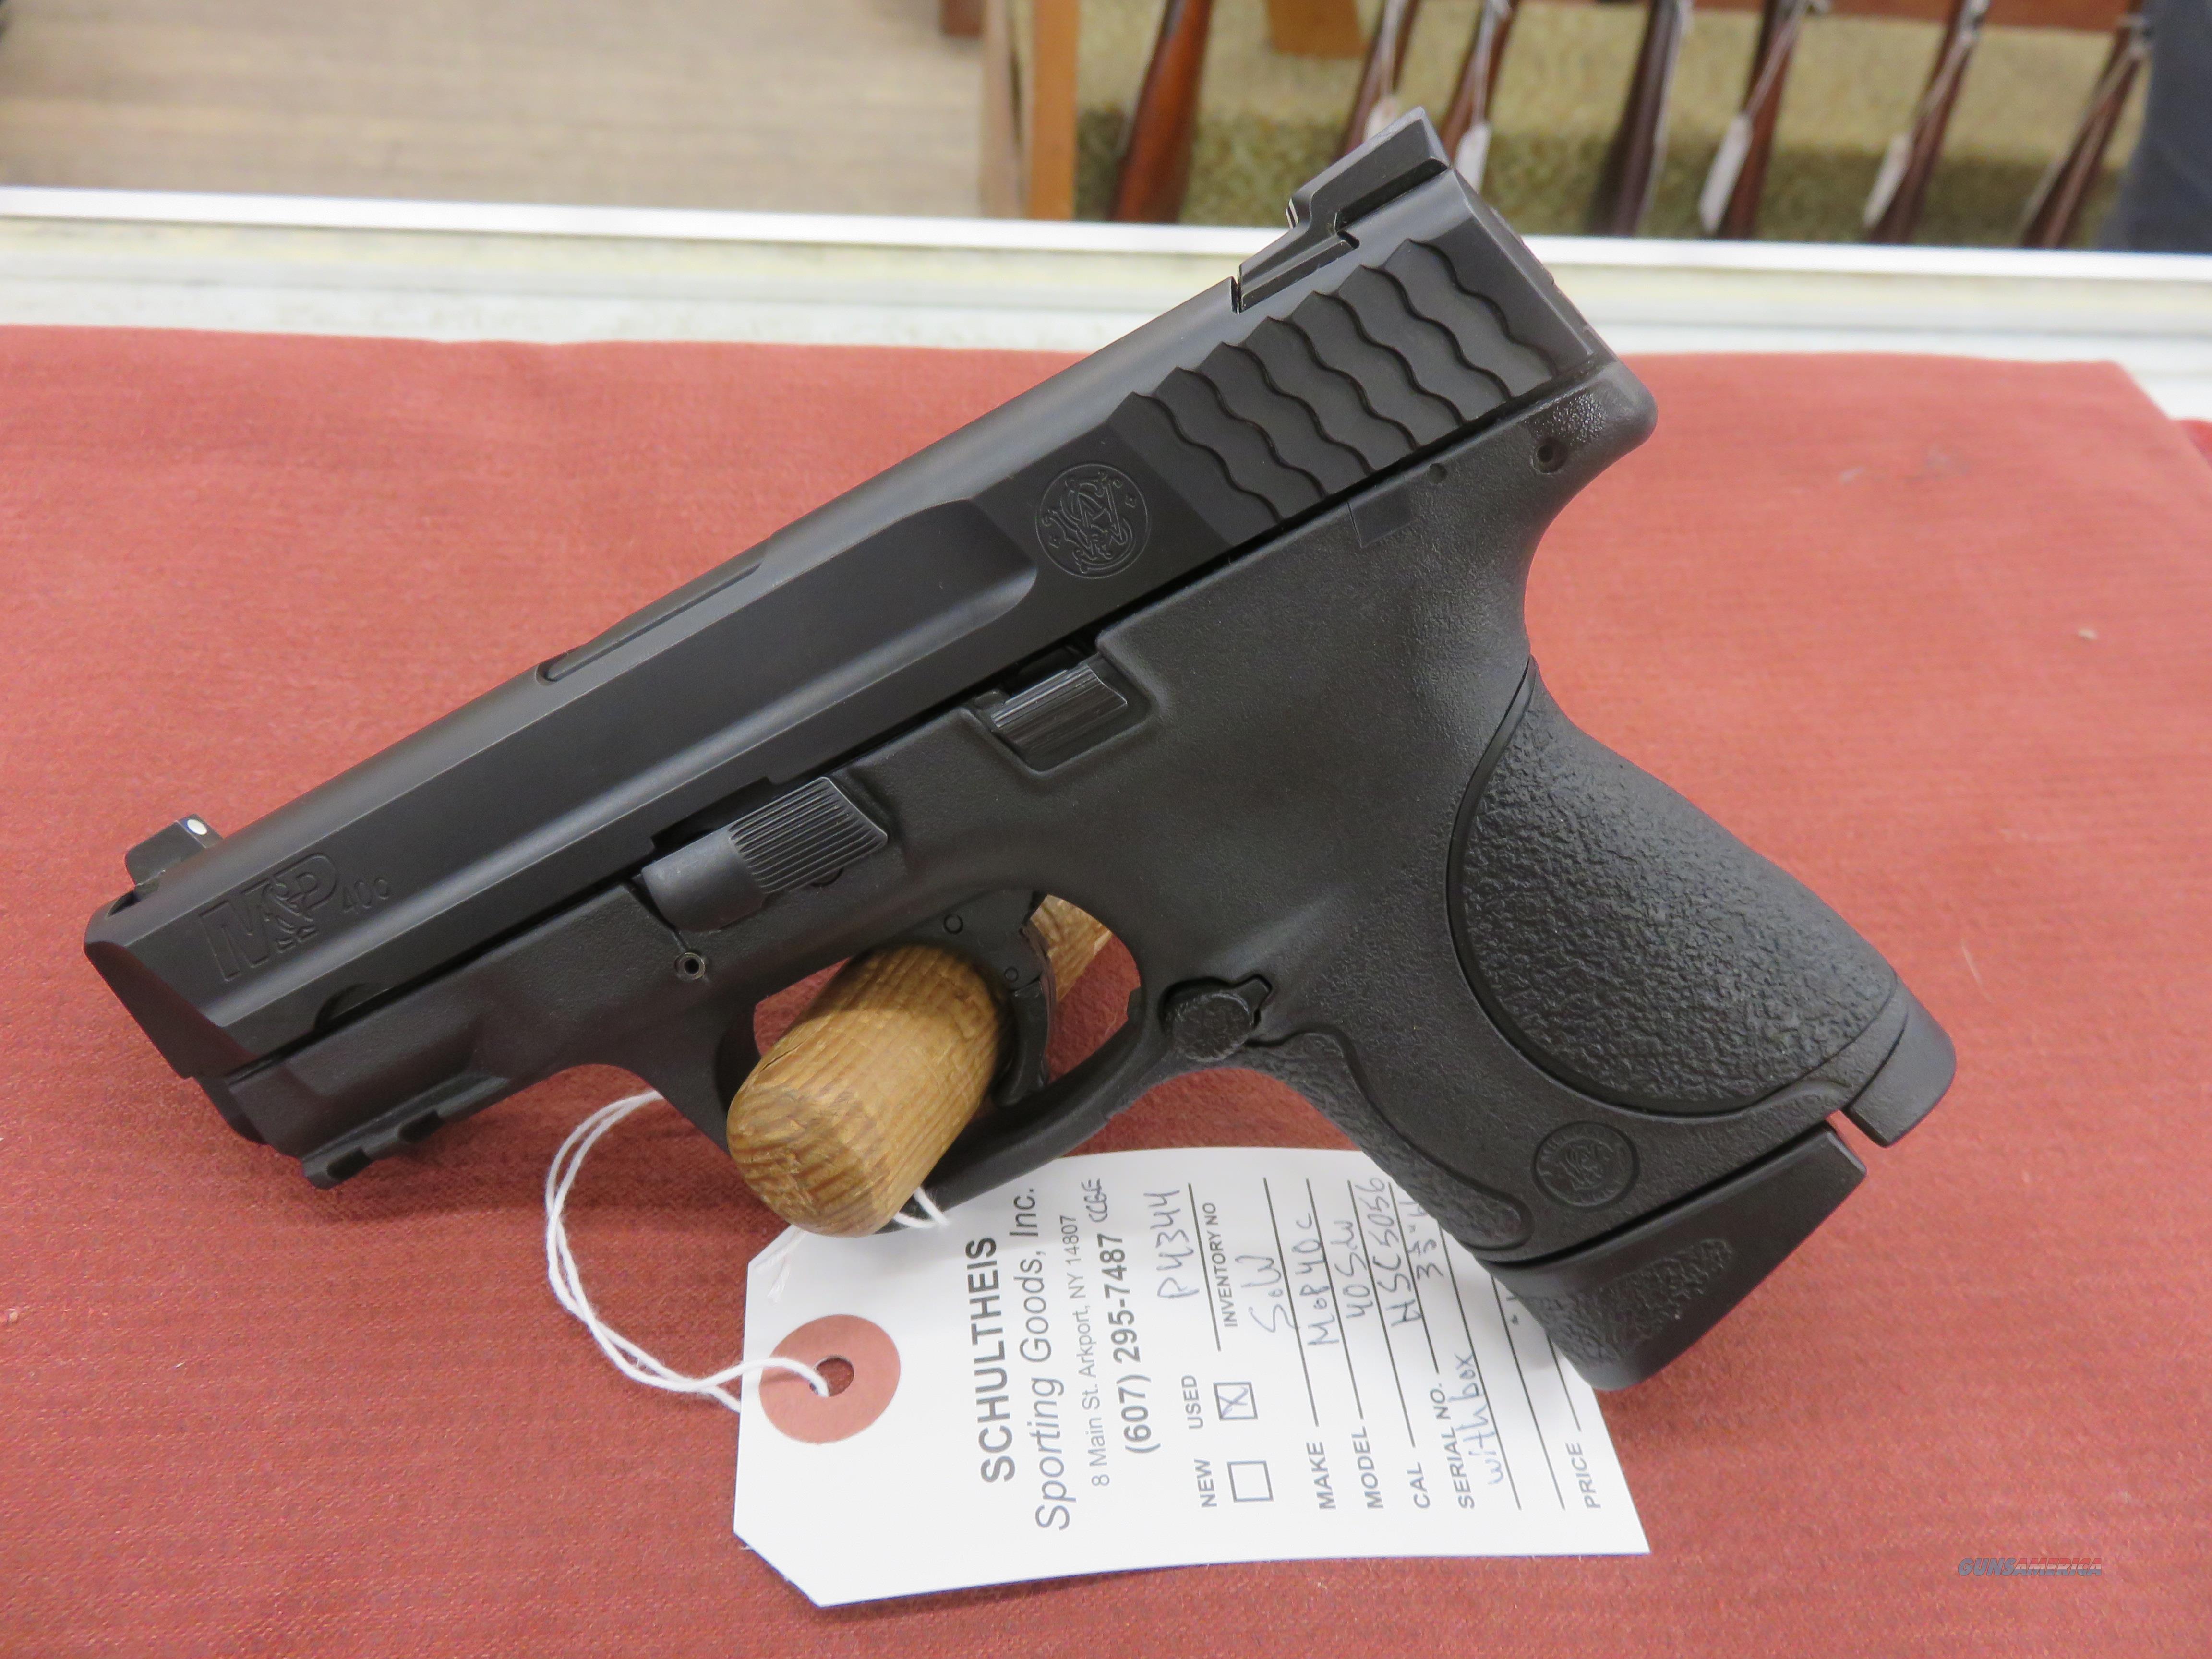 Smith & Wesson  M&P40c  40 S&W  Guns > Pistols > Smith & Wesson Pistols - Autos > Shield